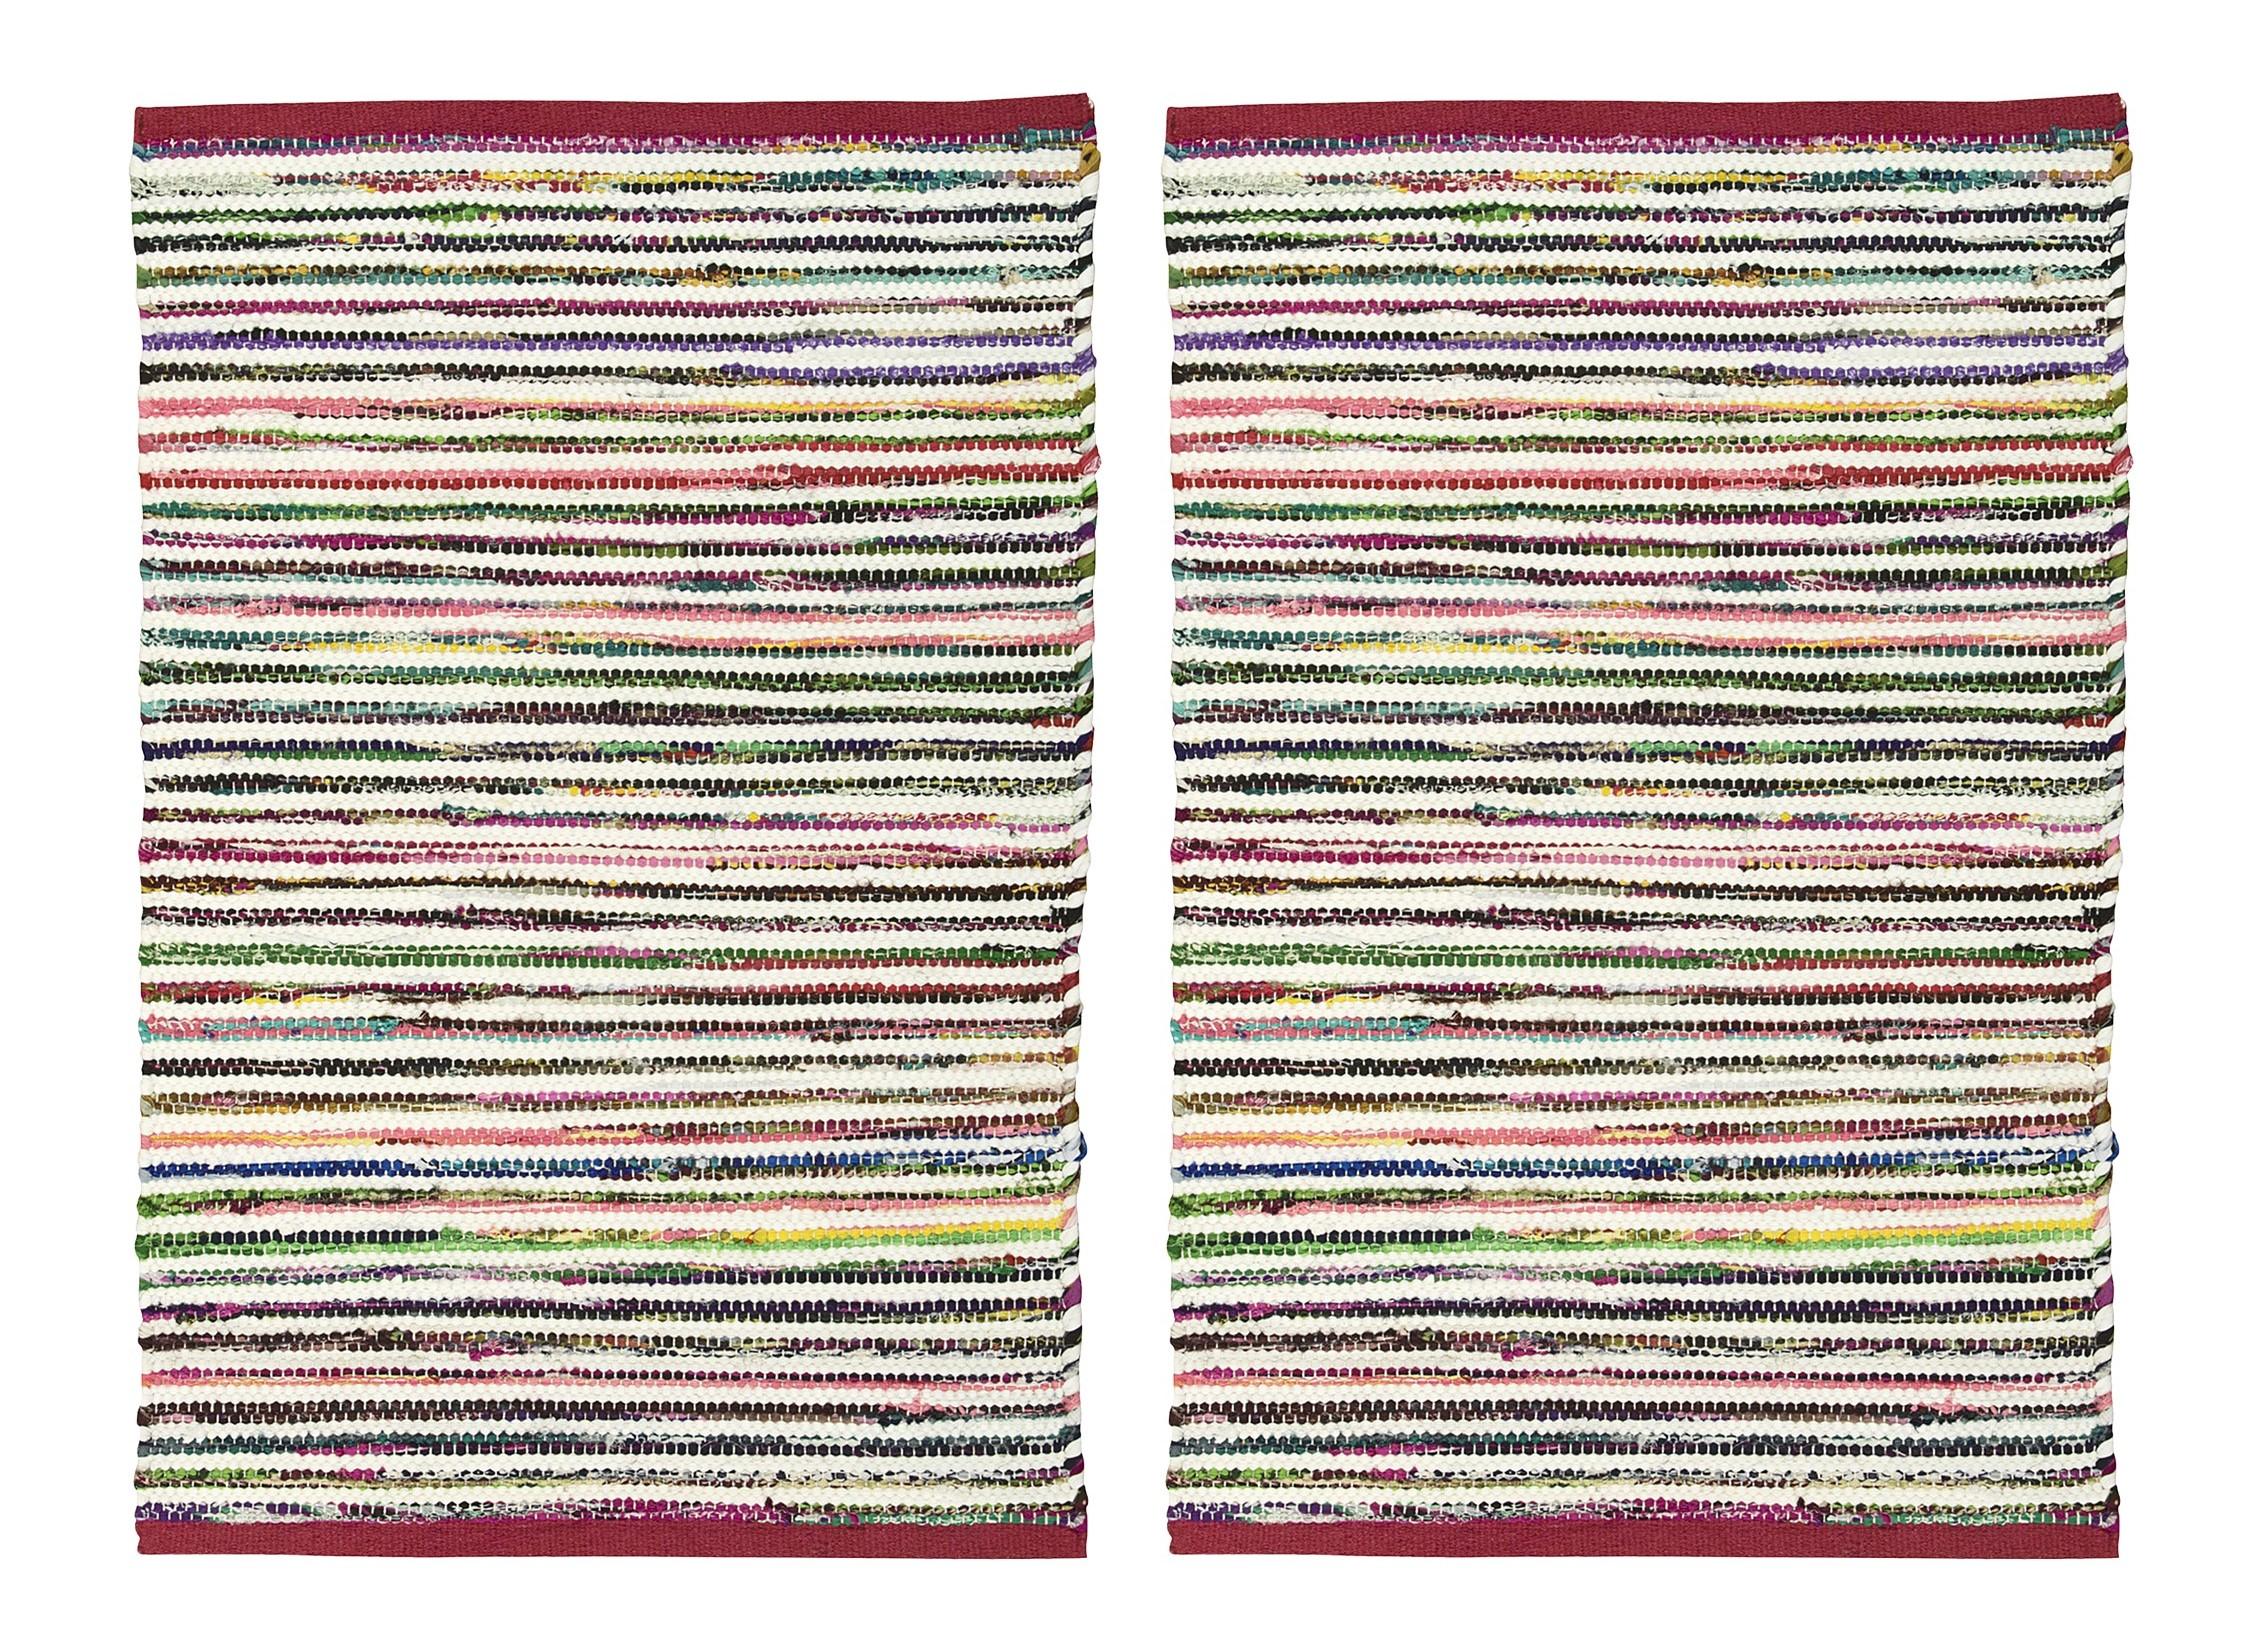 2-PACK-Nourison-Montclair-Stripe-Accent-Floor-Area-Rugs-24-034-x-36-034-or-30-034-x-48-034 thumbnail 5